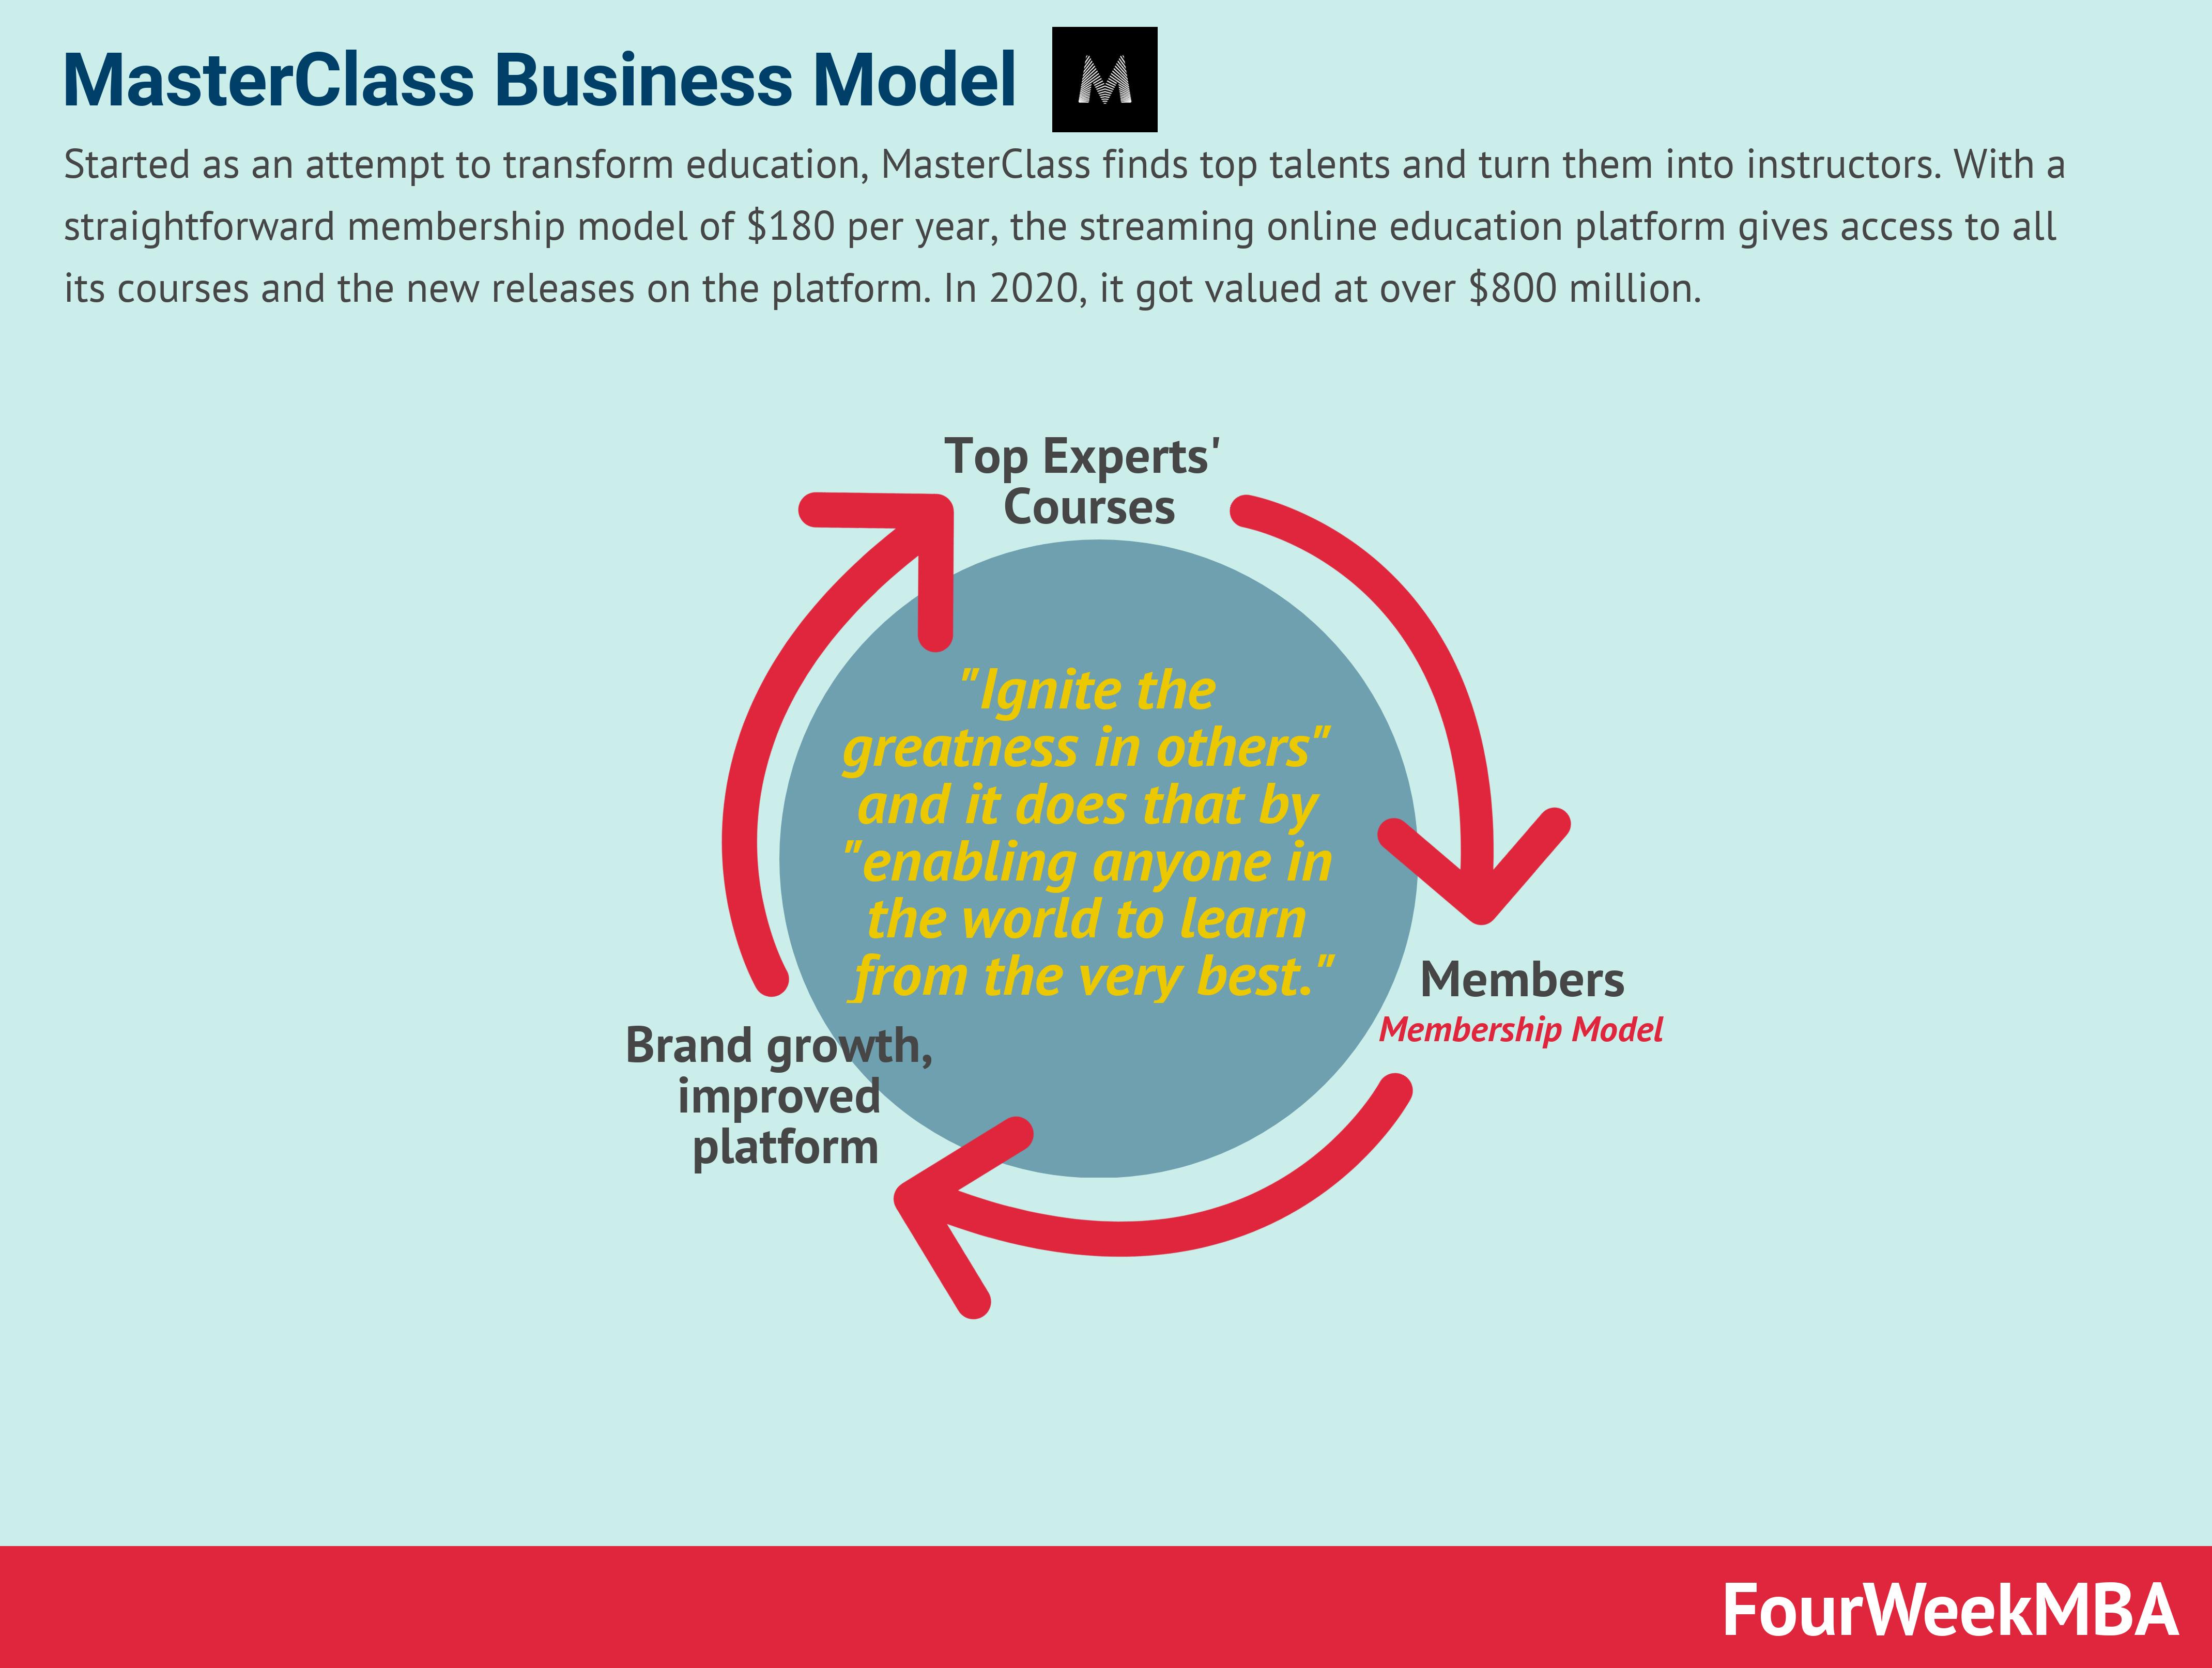 masterclass-business-model